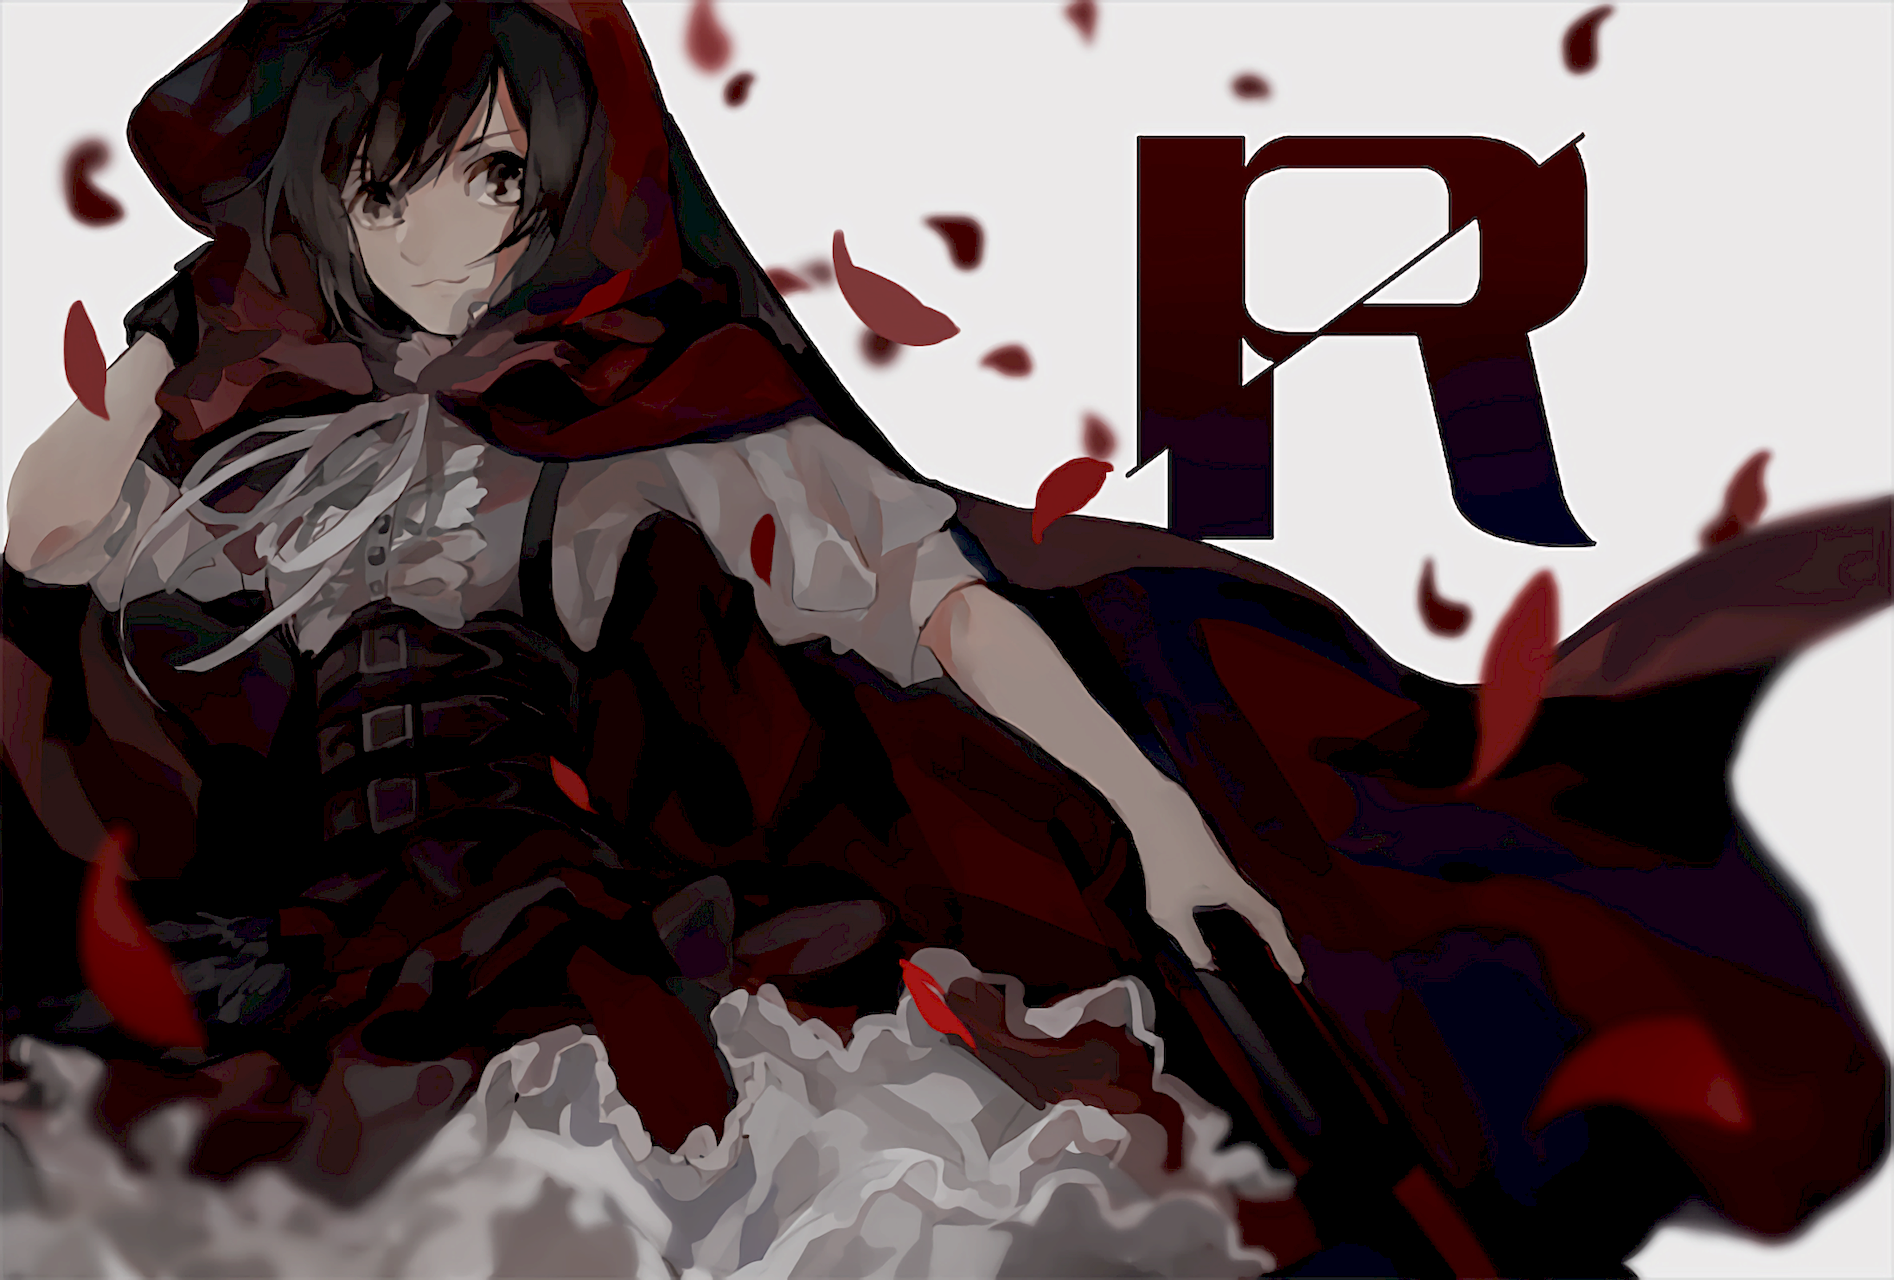 Anime - RWBY  Ruby Rose (RWBY) Wallpaper